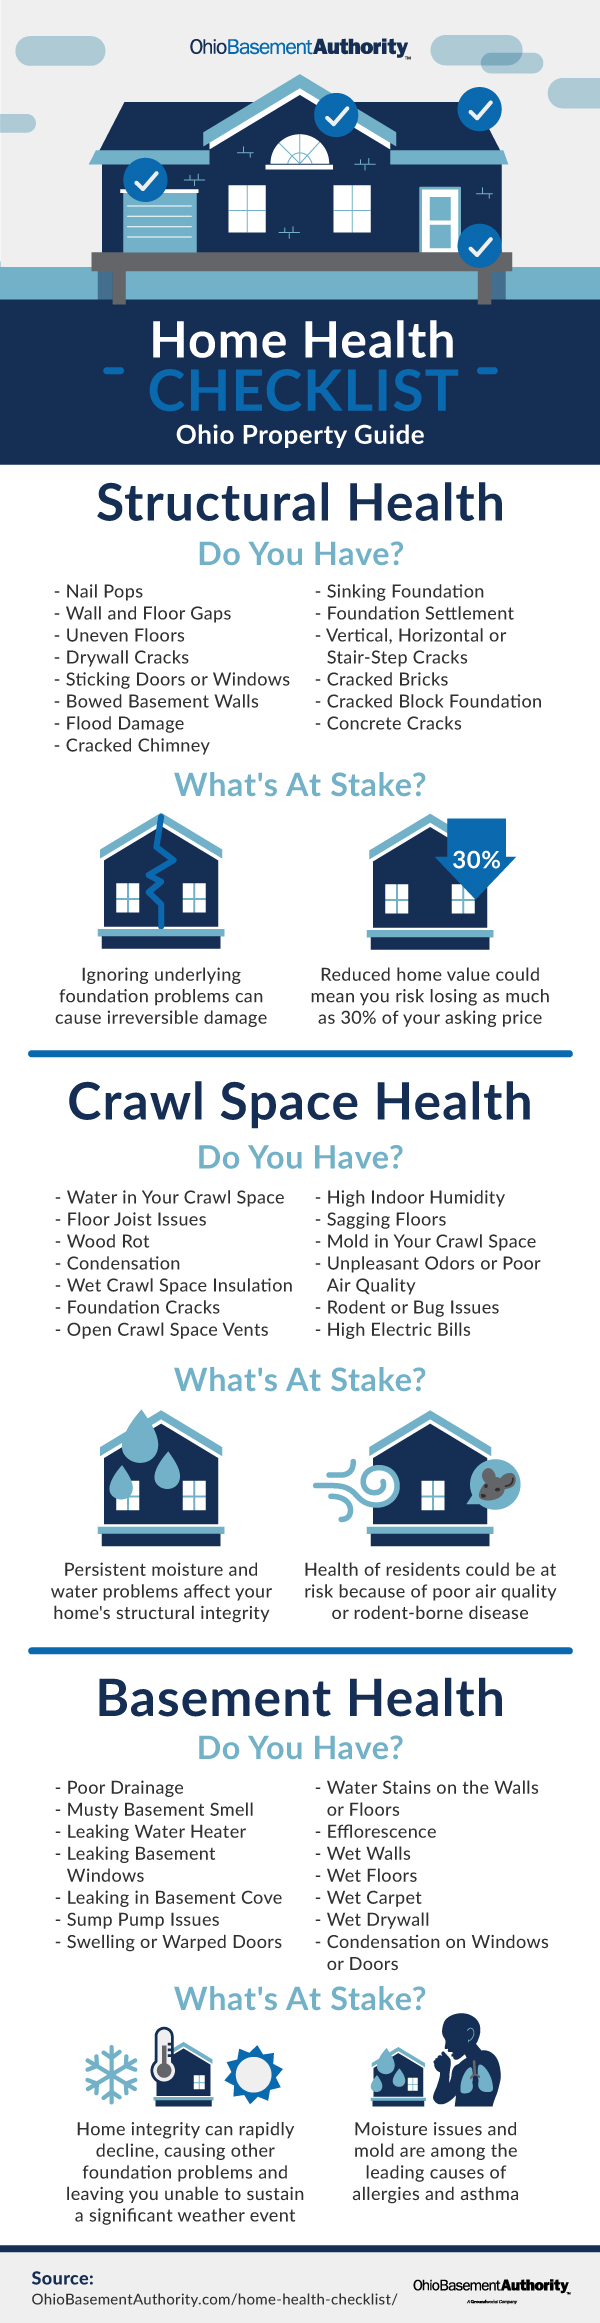 home-health-checklist